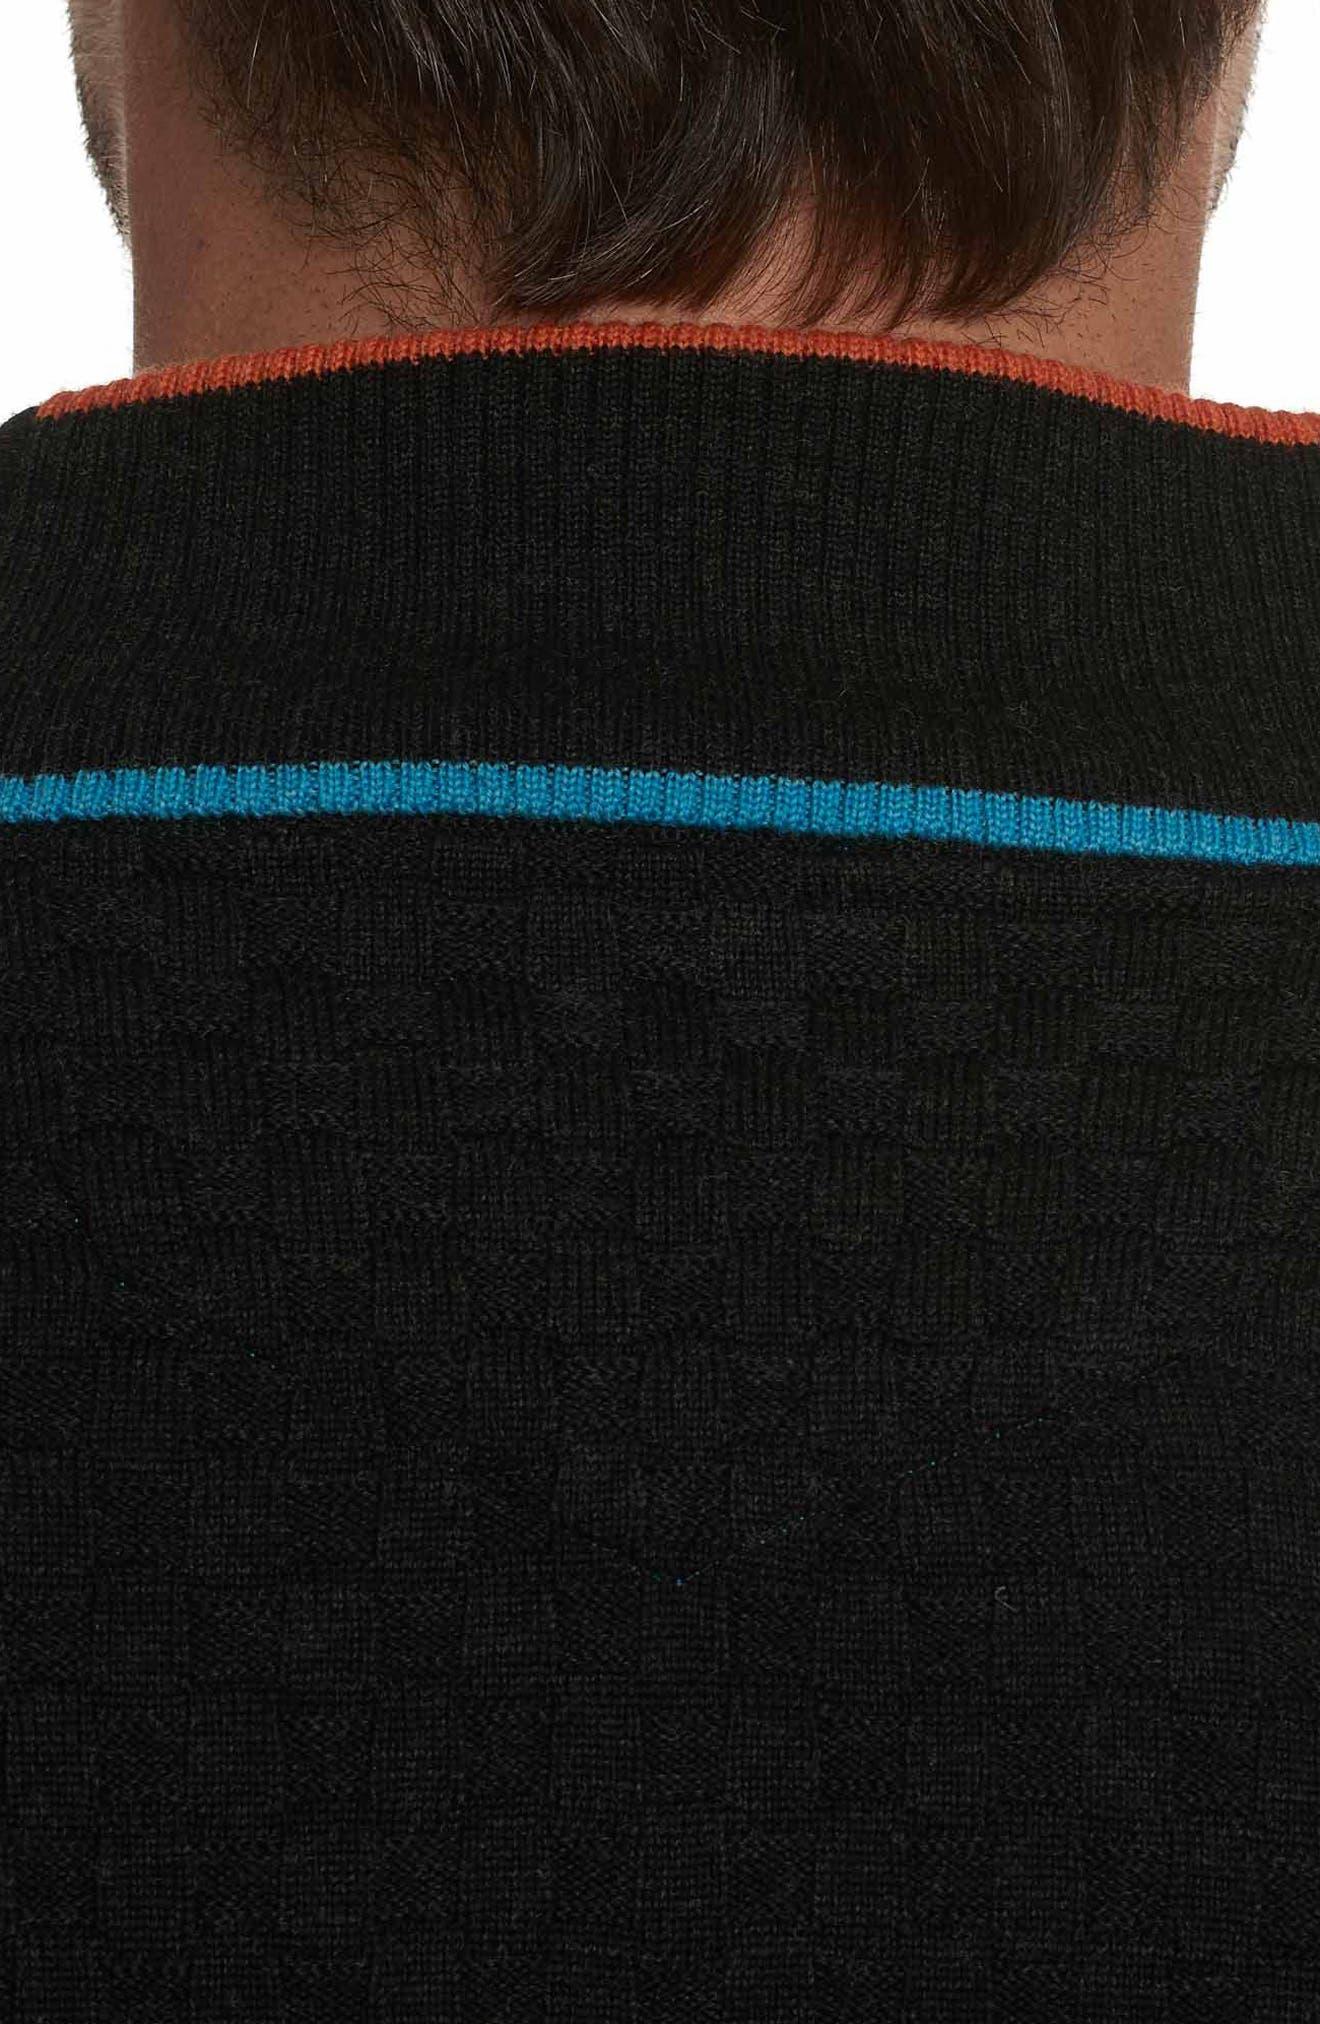 American Beech Wool Sweater,                             Alternate thumbnail 3, color,                             001